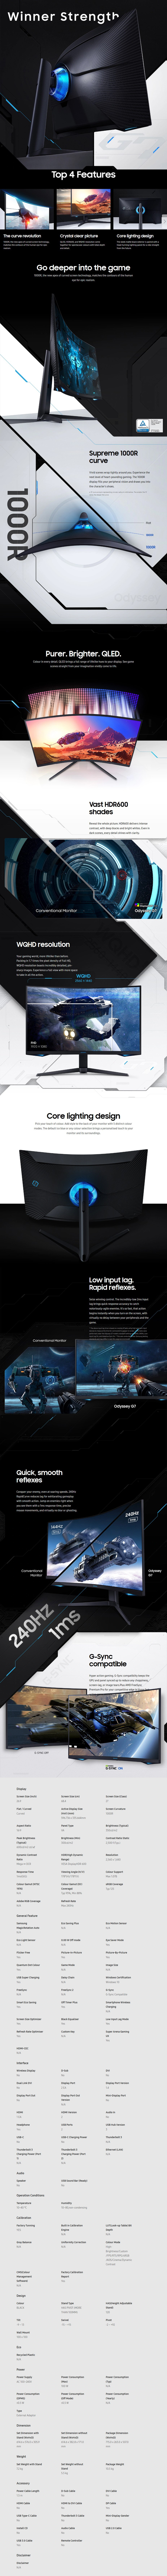 samsung-lc27g75tqs-27-240hz-qhd-1ms-curved-gaming-monitor-ac33401-7.jpg